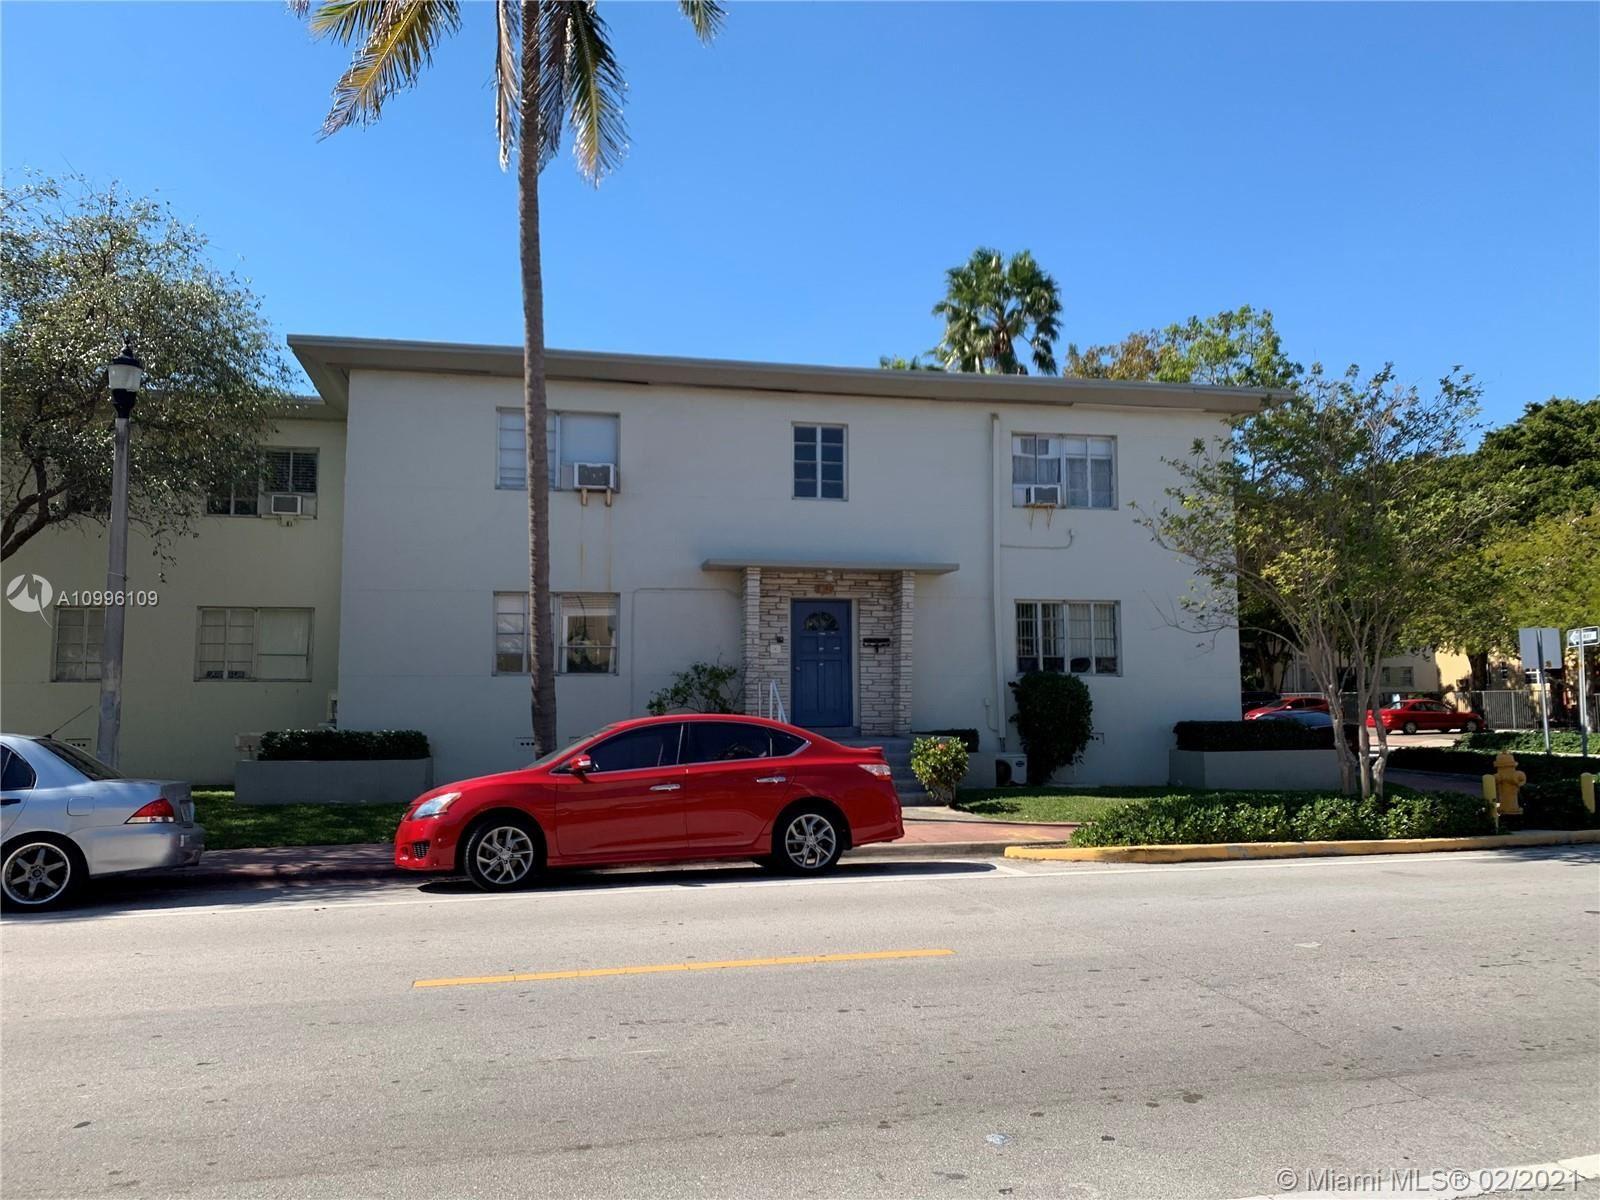 8340 Crespi Blvd #21, Miami Beach, FL 33141 - #: A10996109